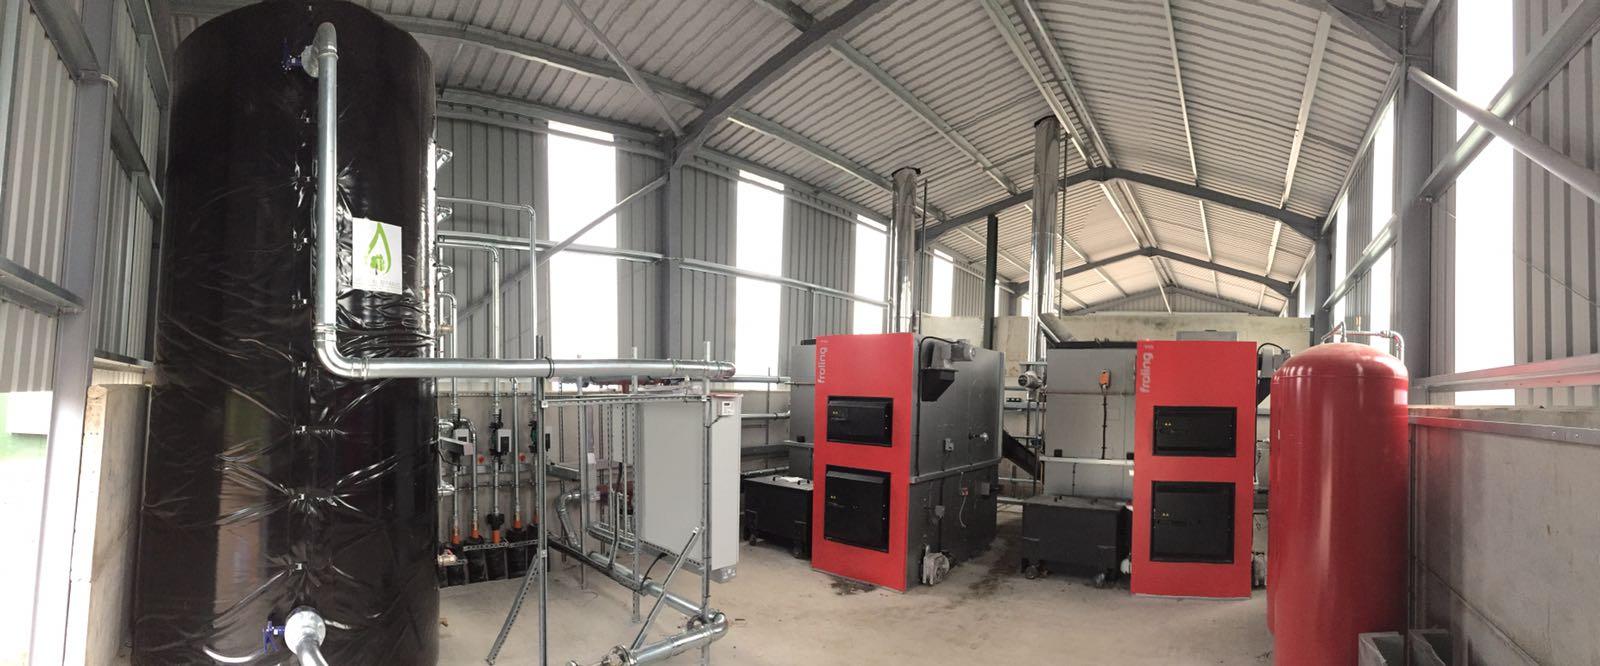 1MW Froling Biomass boiler installation poultry farm